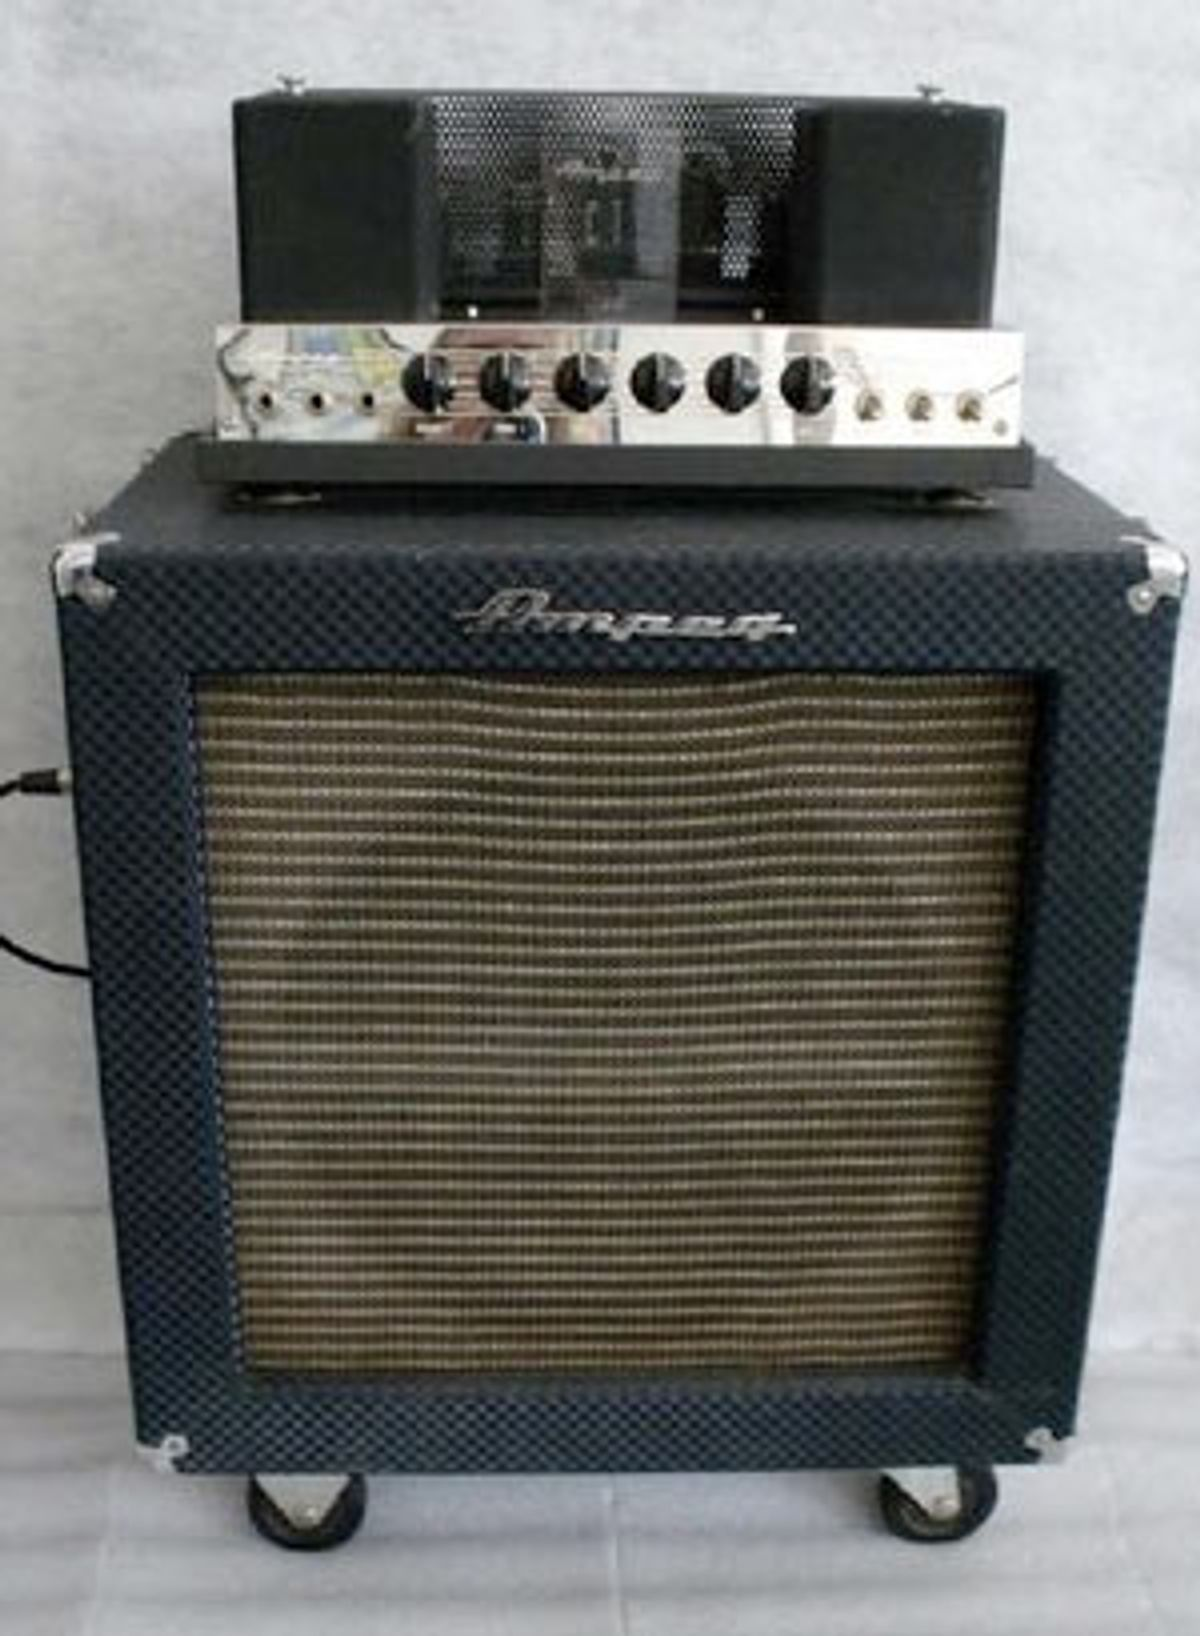 New Speaker Plug for an Ampeg B-15-N